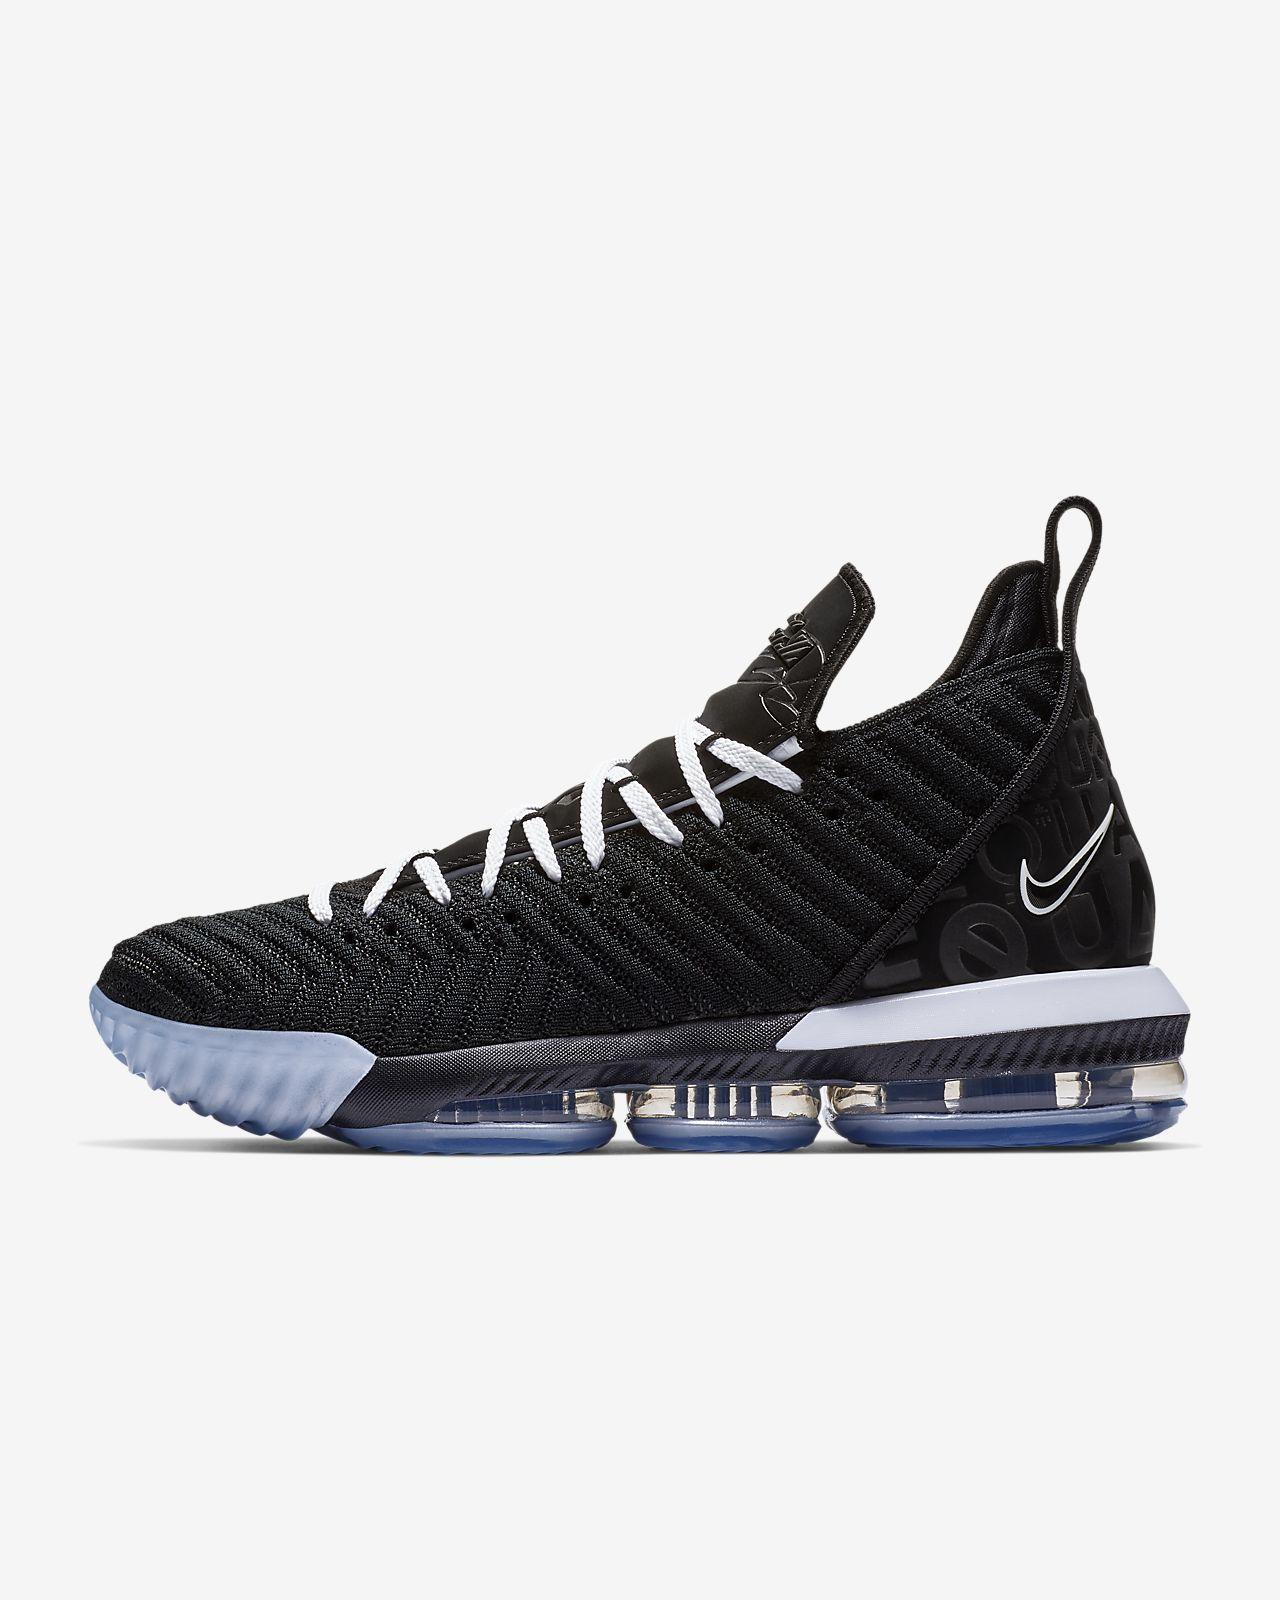 58b5736992c LeBron 16 Basketball Shoe. Nike.com DK